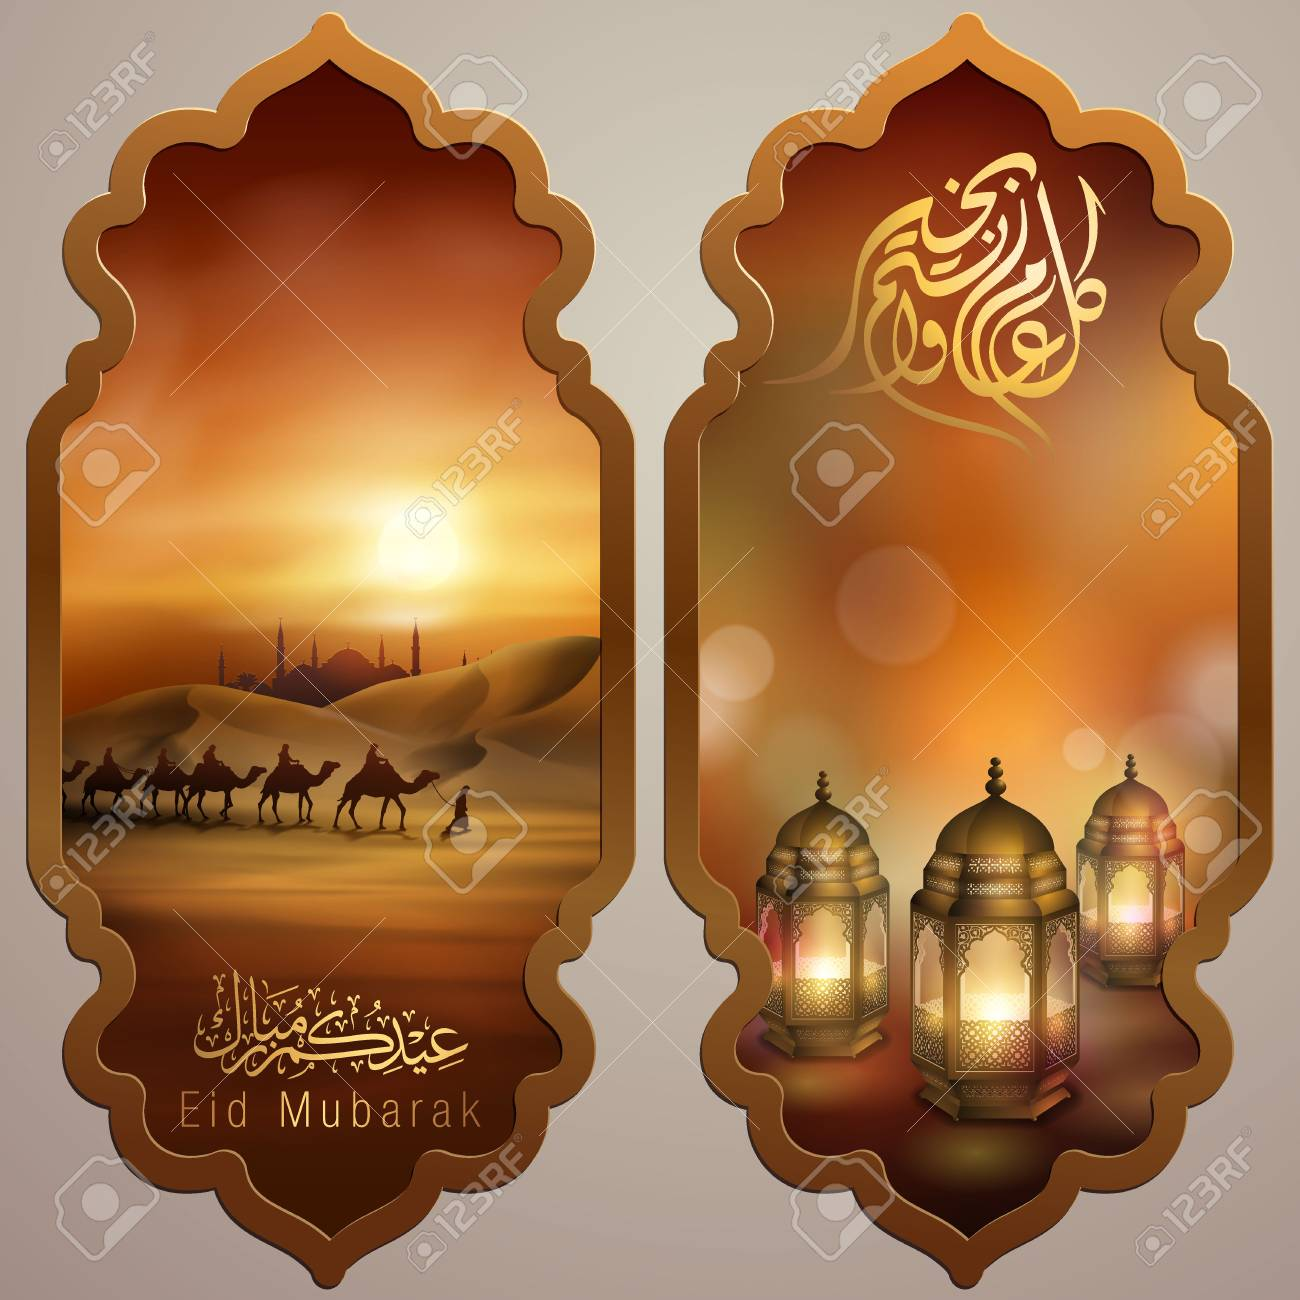 Eid mubarak islamic greeting card template arabic landscape and lantern illustration - 100933632